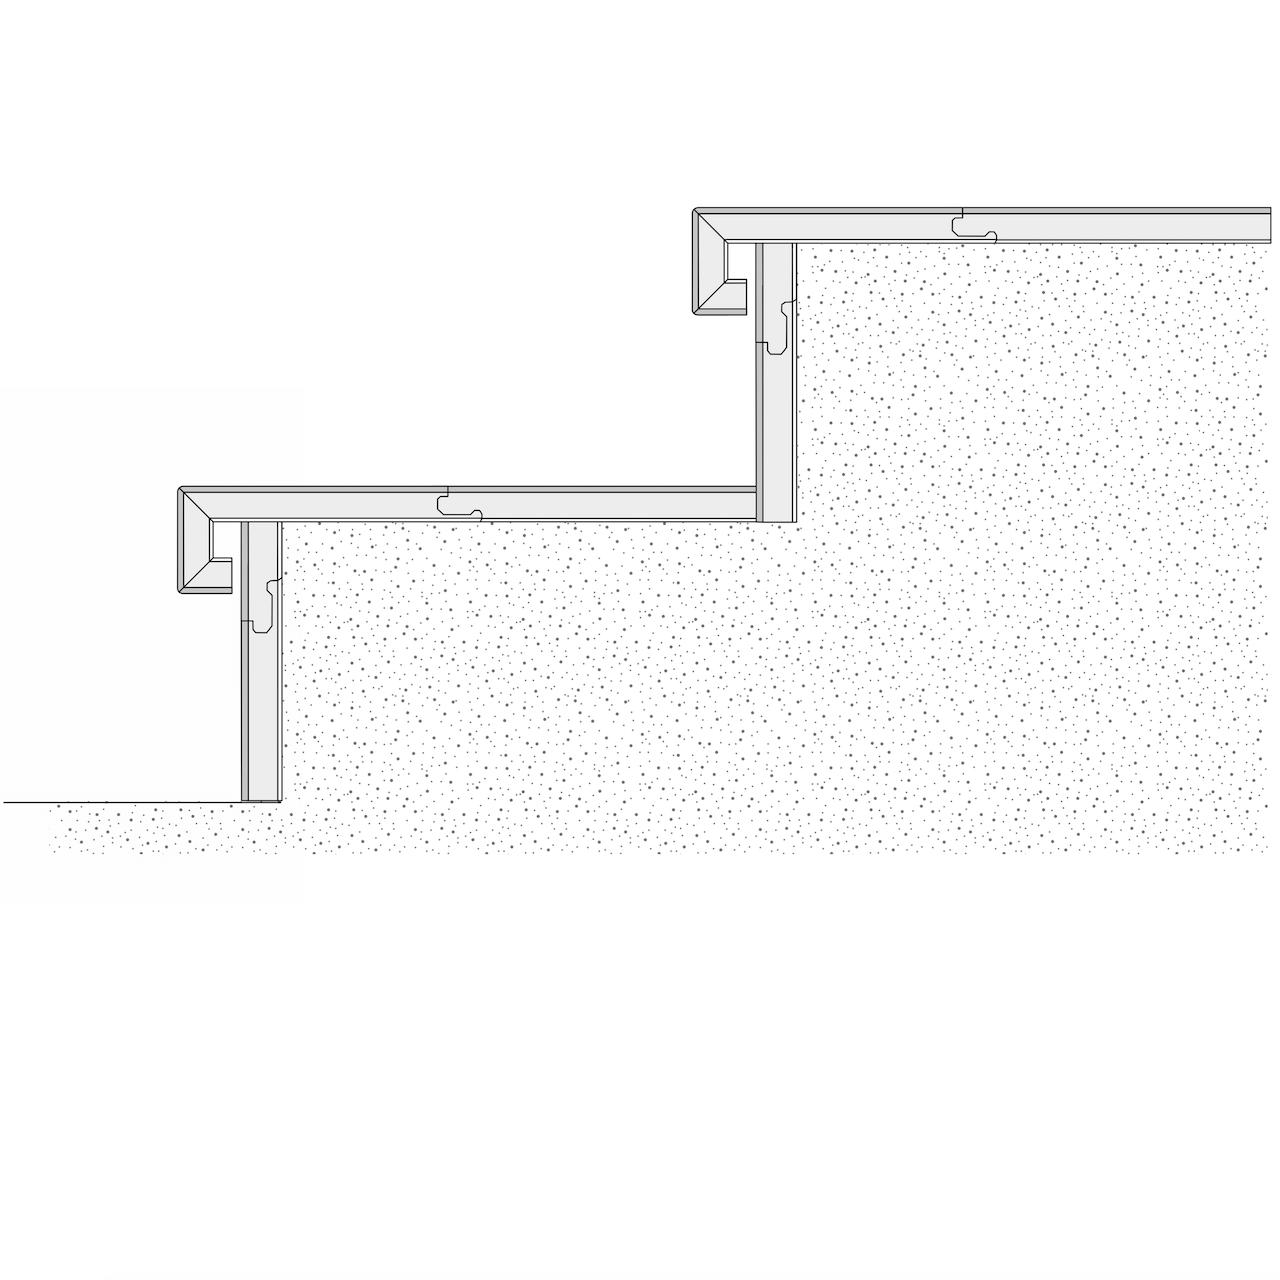 Treppenstufe Klassik 40 Parkett Eiche Bella